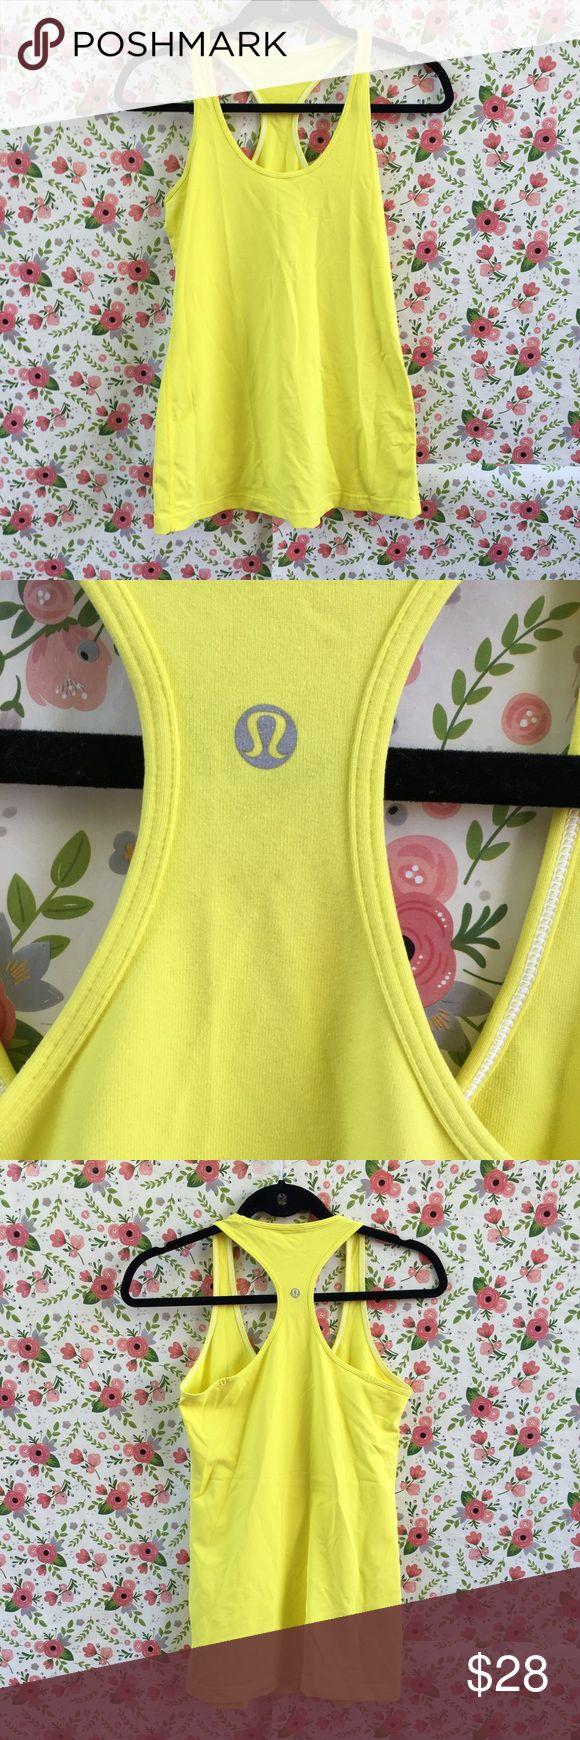 Lululemon Yellow Tank Top In good condition lululemon athletica Tops Tank Tops